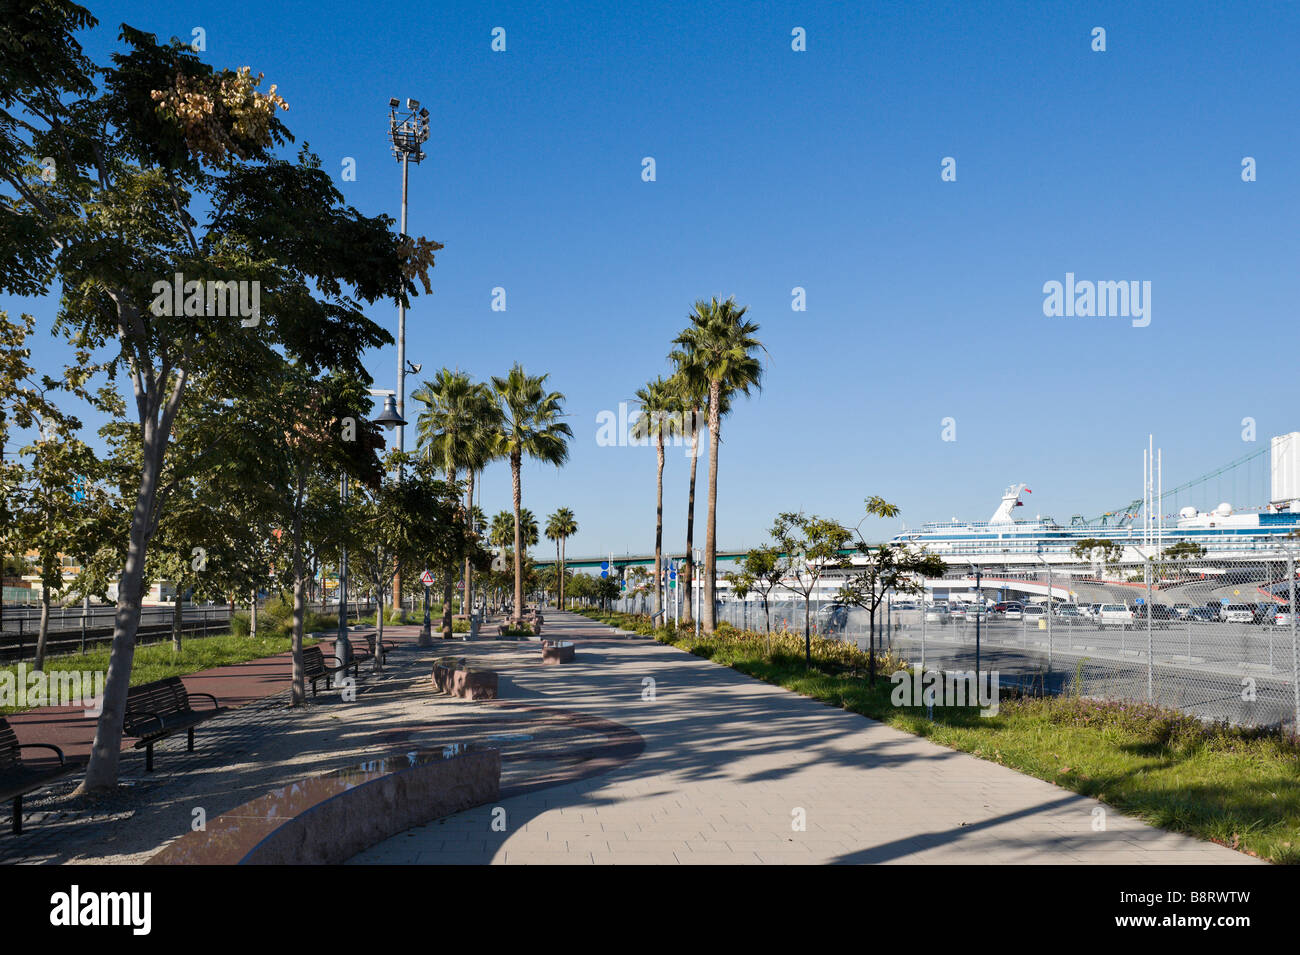 Promenade near the Cruise Terminal, Port of Los Angeles, San Pedro, Los Angeles, California, USA Stock Photo